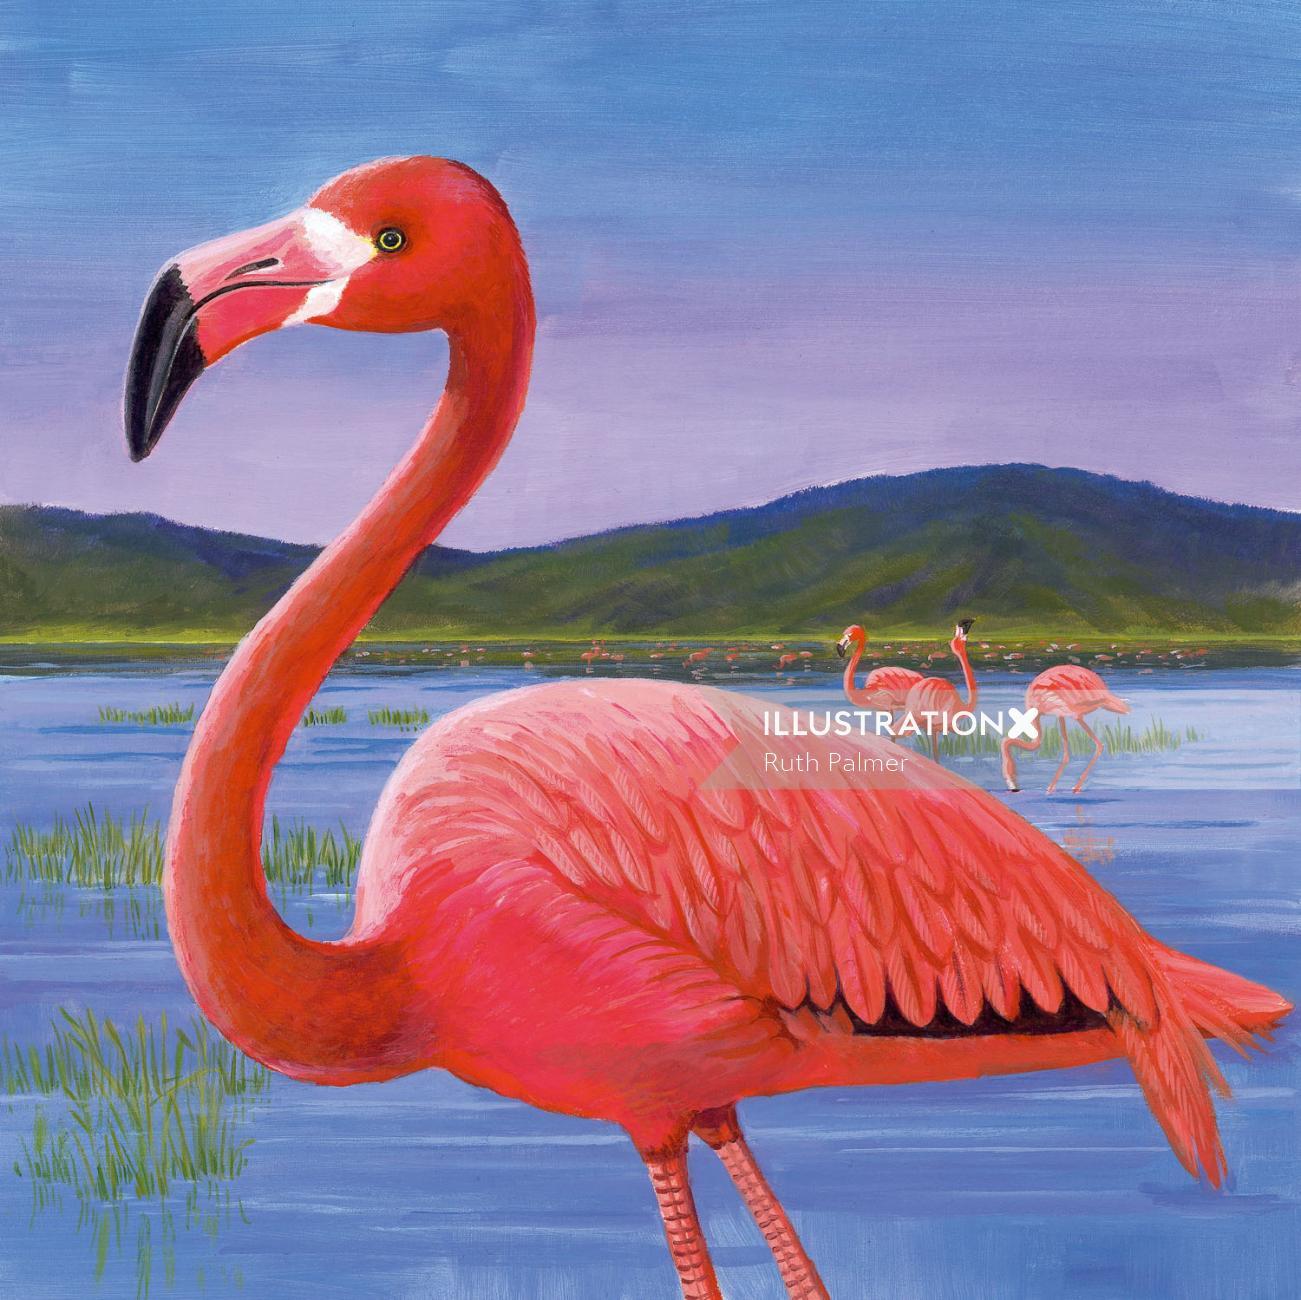 Red crane in lake